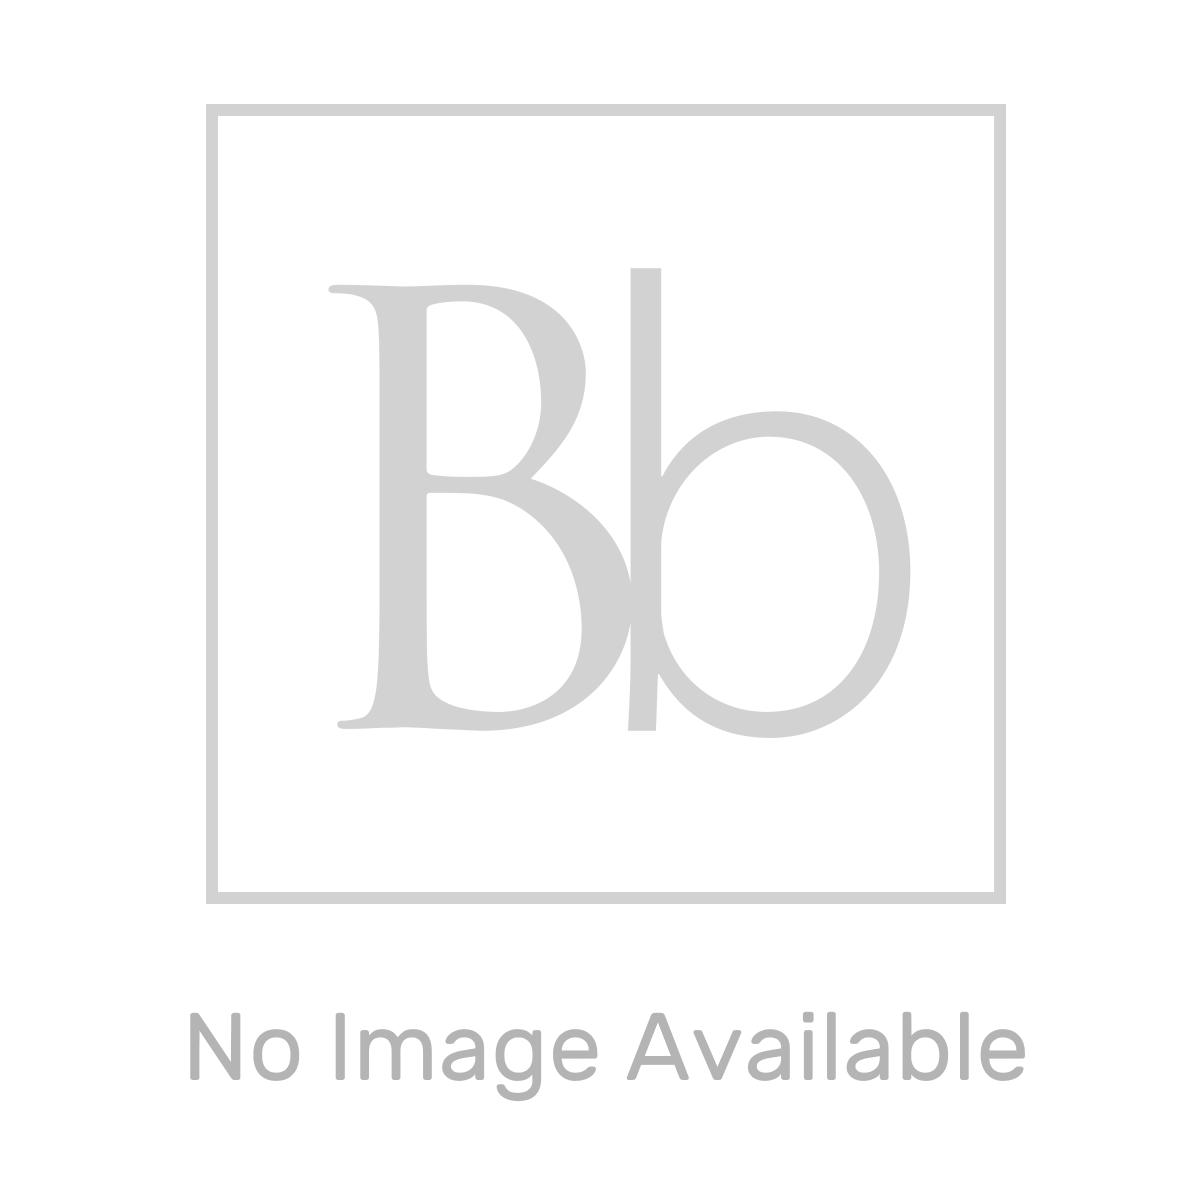 RAK Athens Chrome Dual Handle Kitchen Sink Mixer Tap Measurements